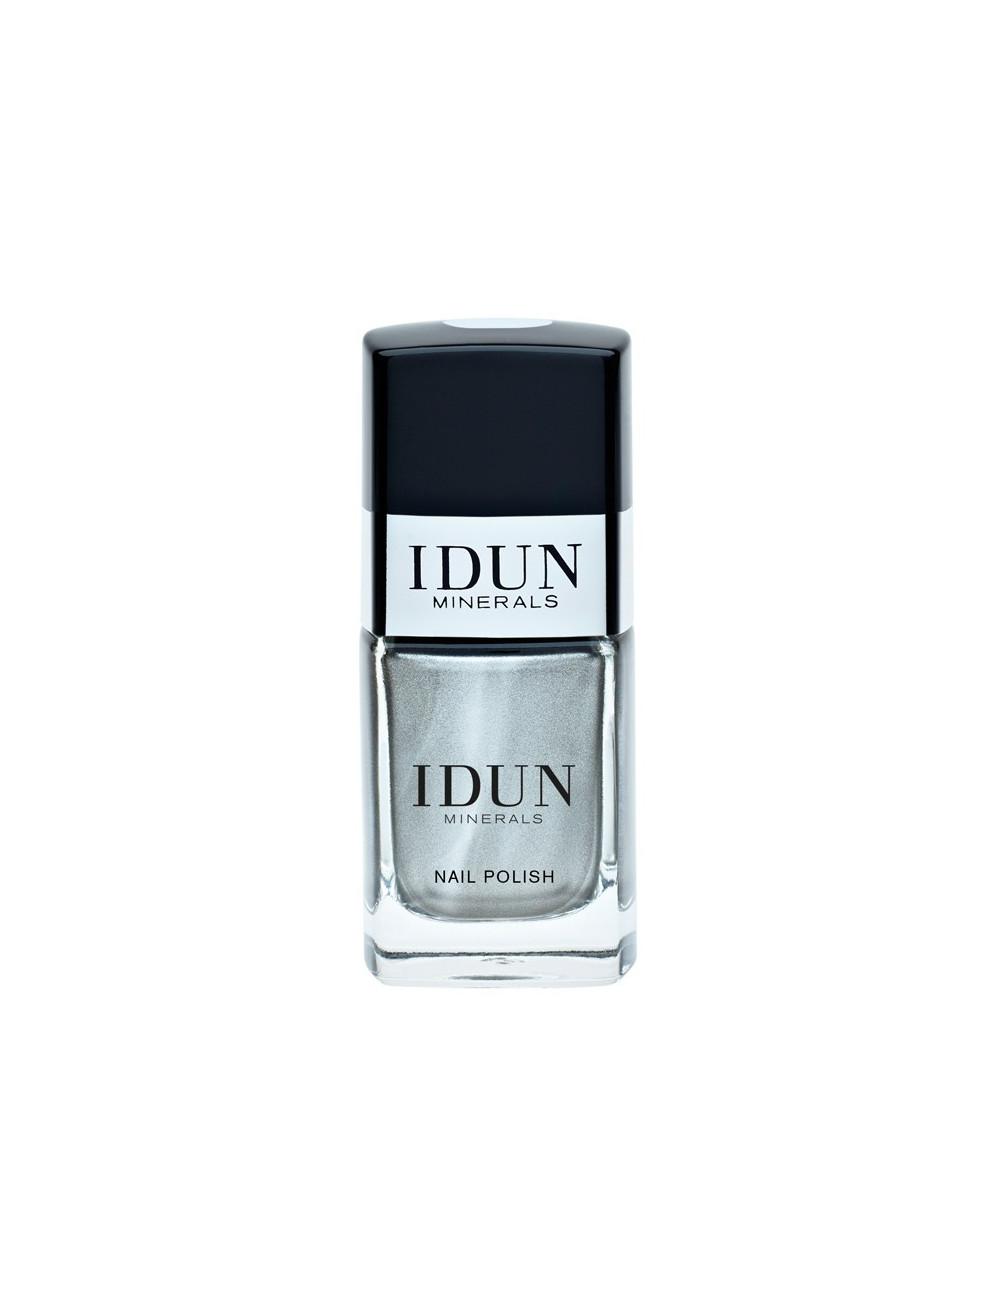 IDUN Minerals črtalo za očiv svinčniku Kol